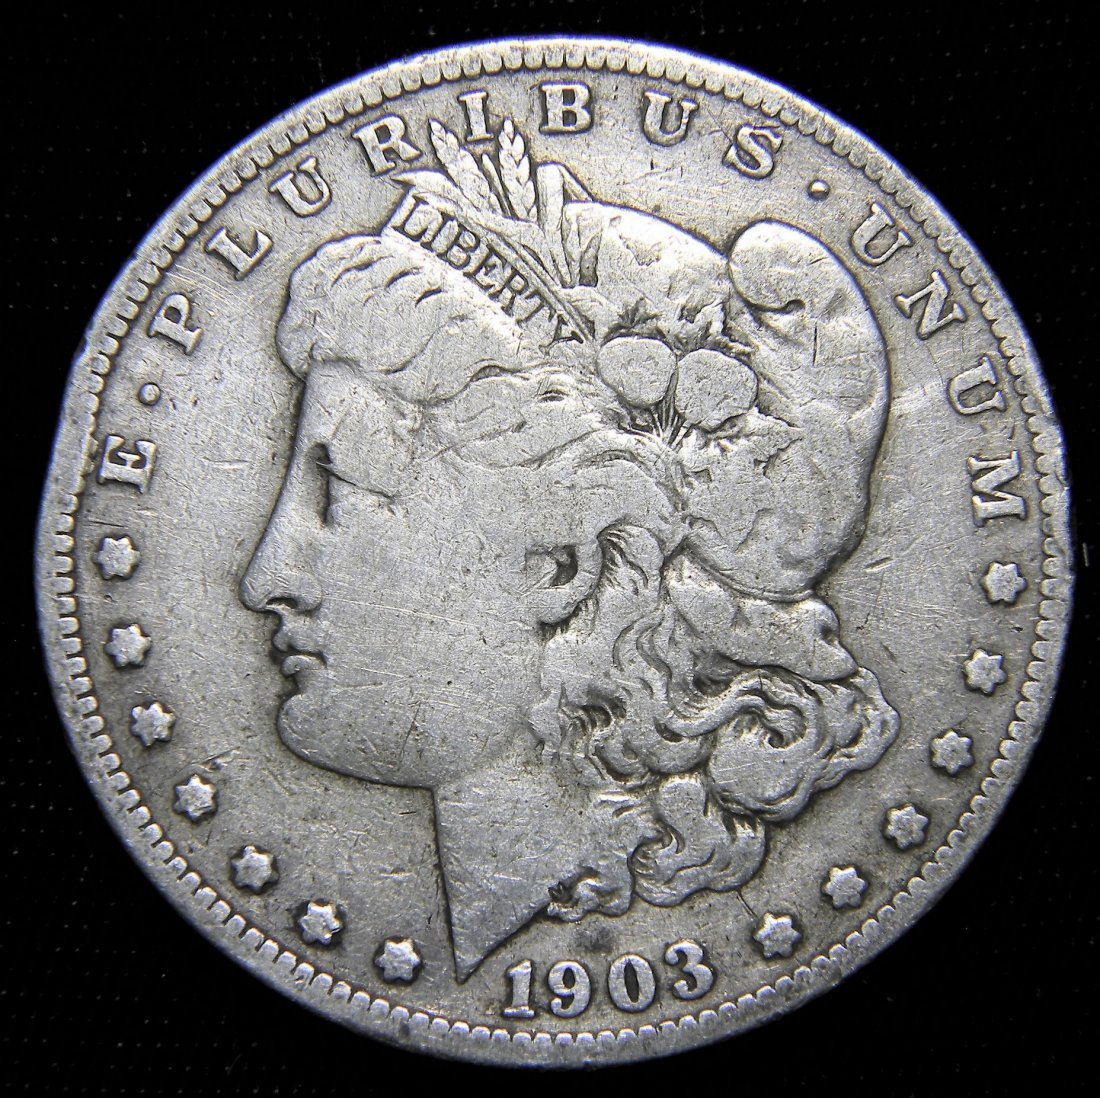 1903-S Morgan Silver Dollar, Very Good + Details